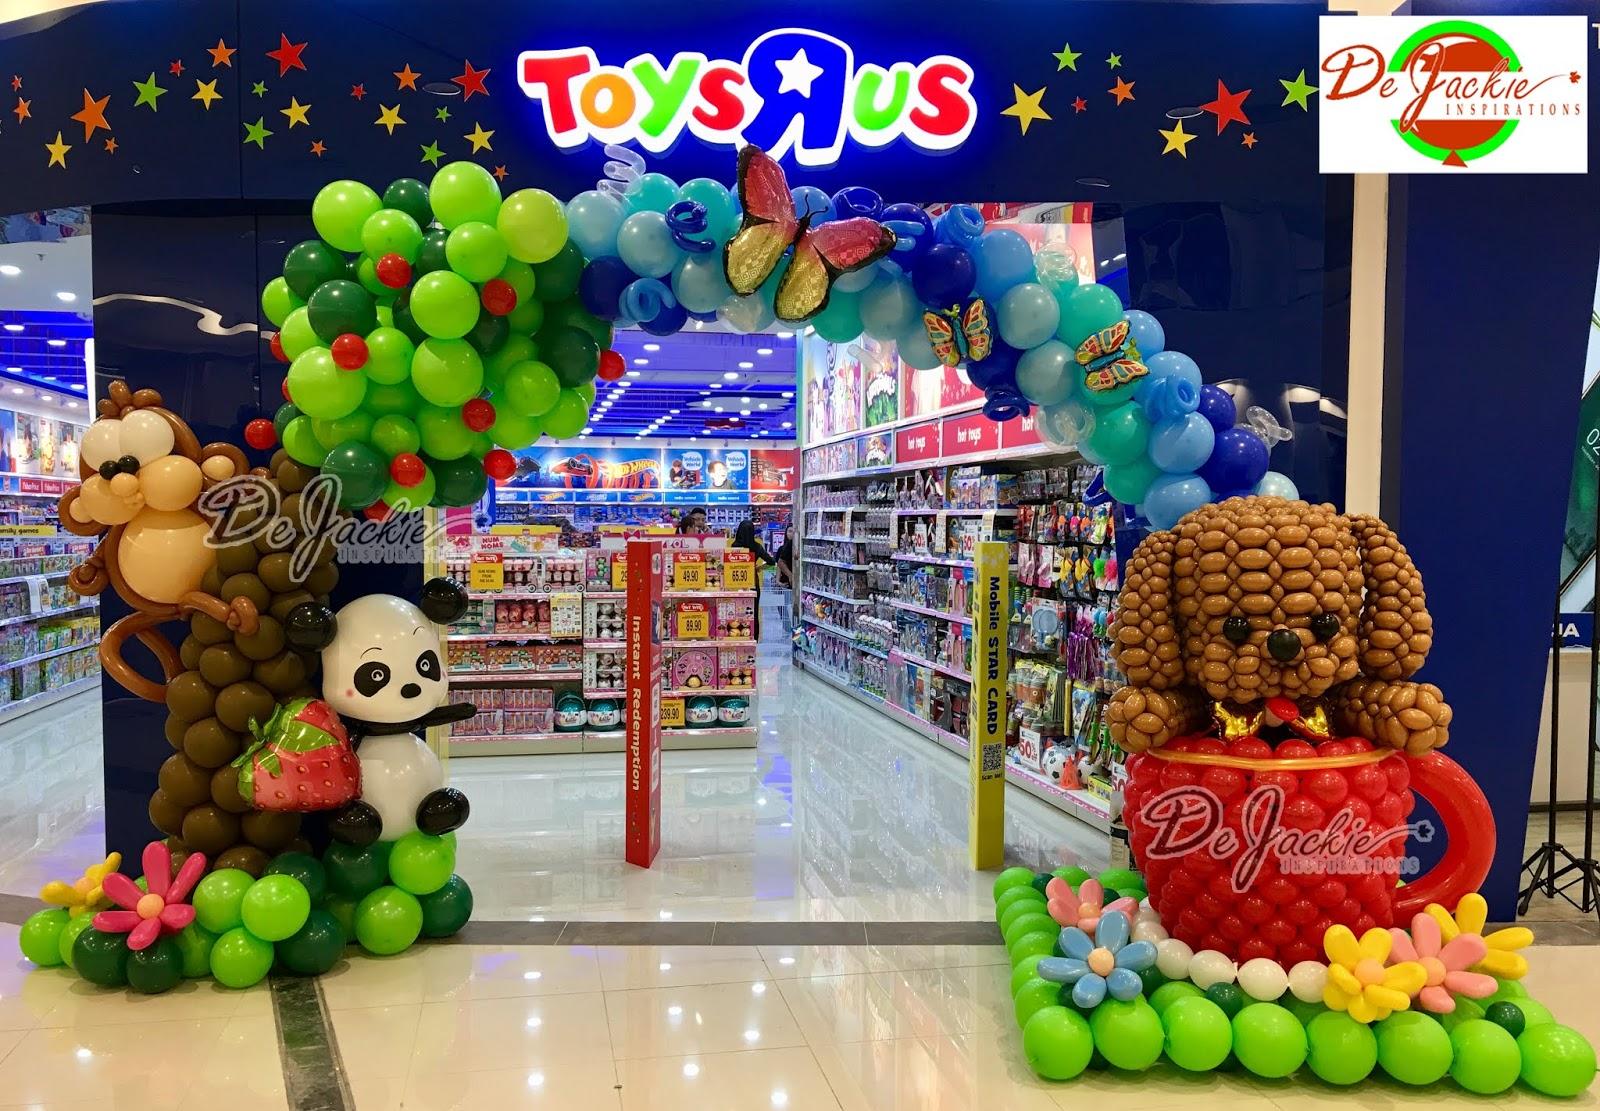 toys r us opening decoration at aeon mall kuching